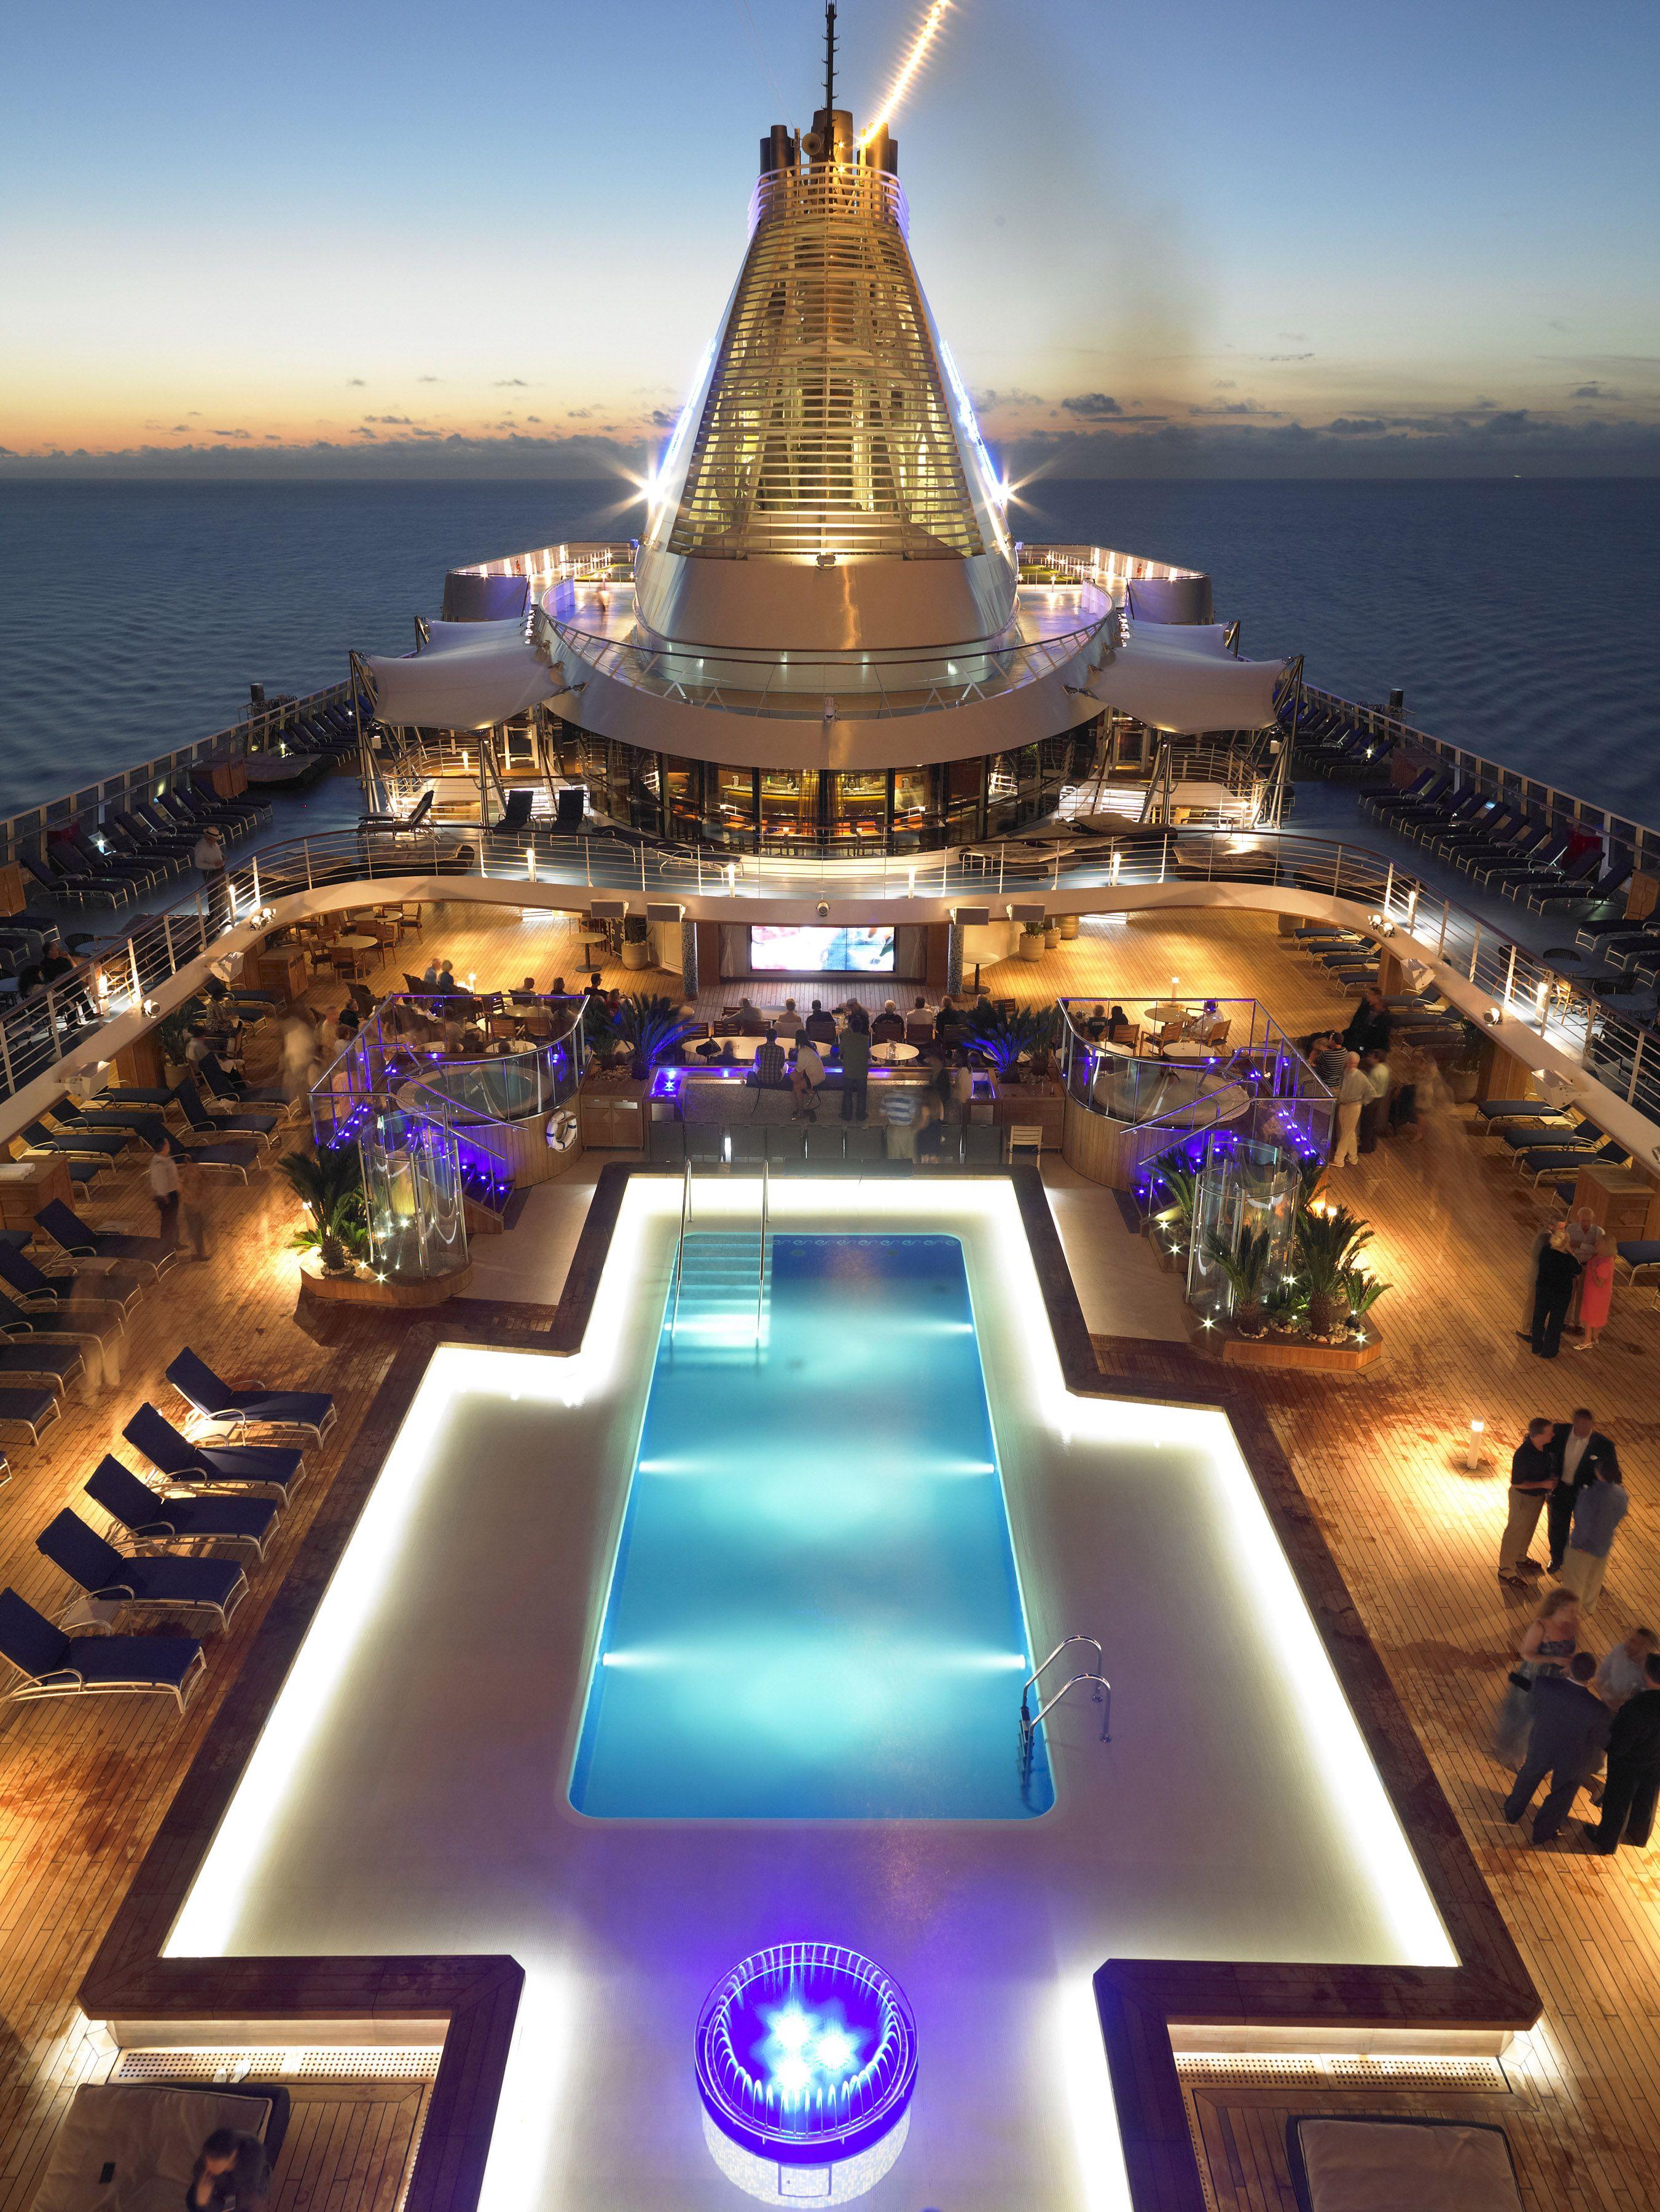 Top Best Carnival Cruises In Cruises Ocean And Resorts - Oceana cruise lines